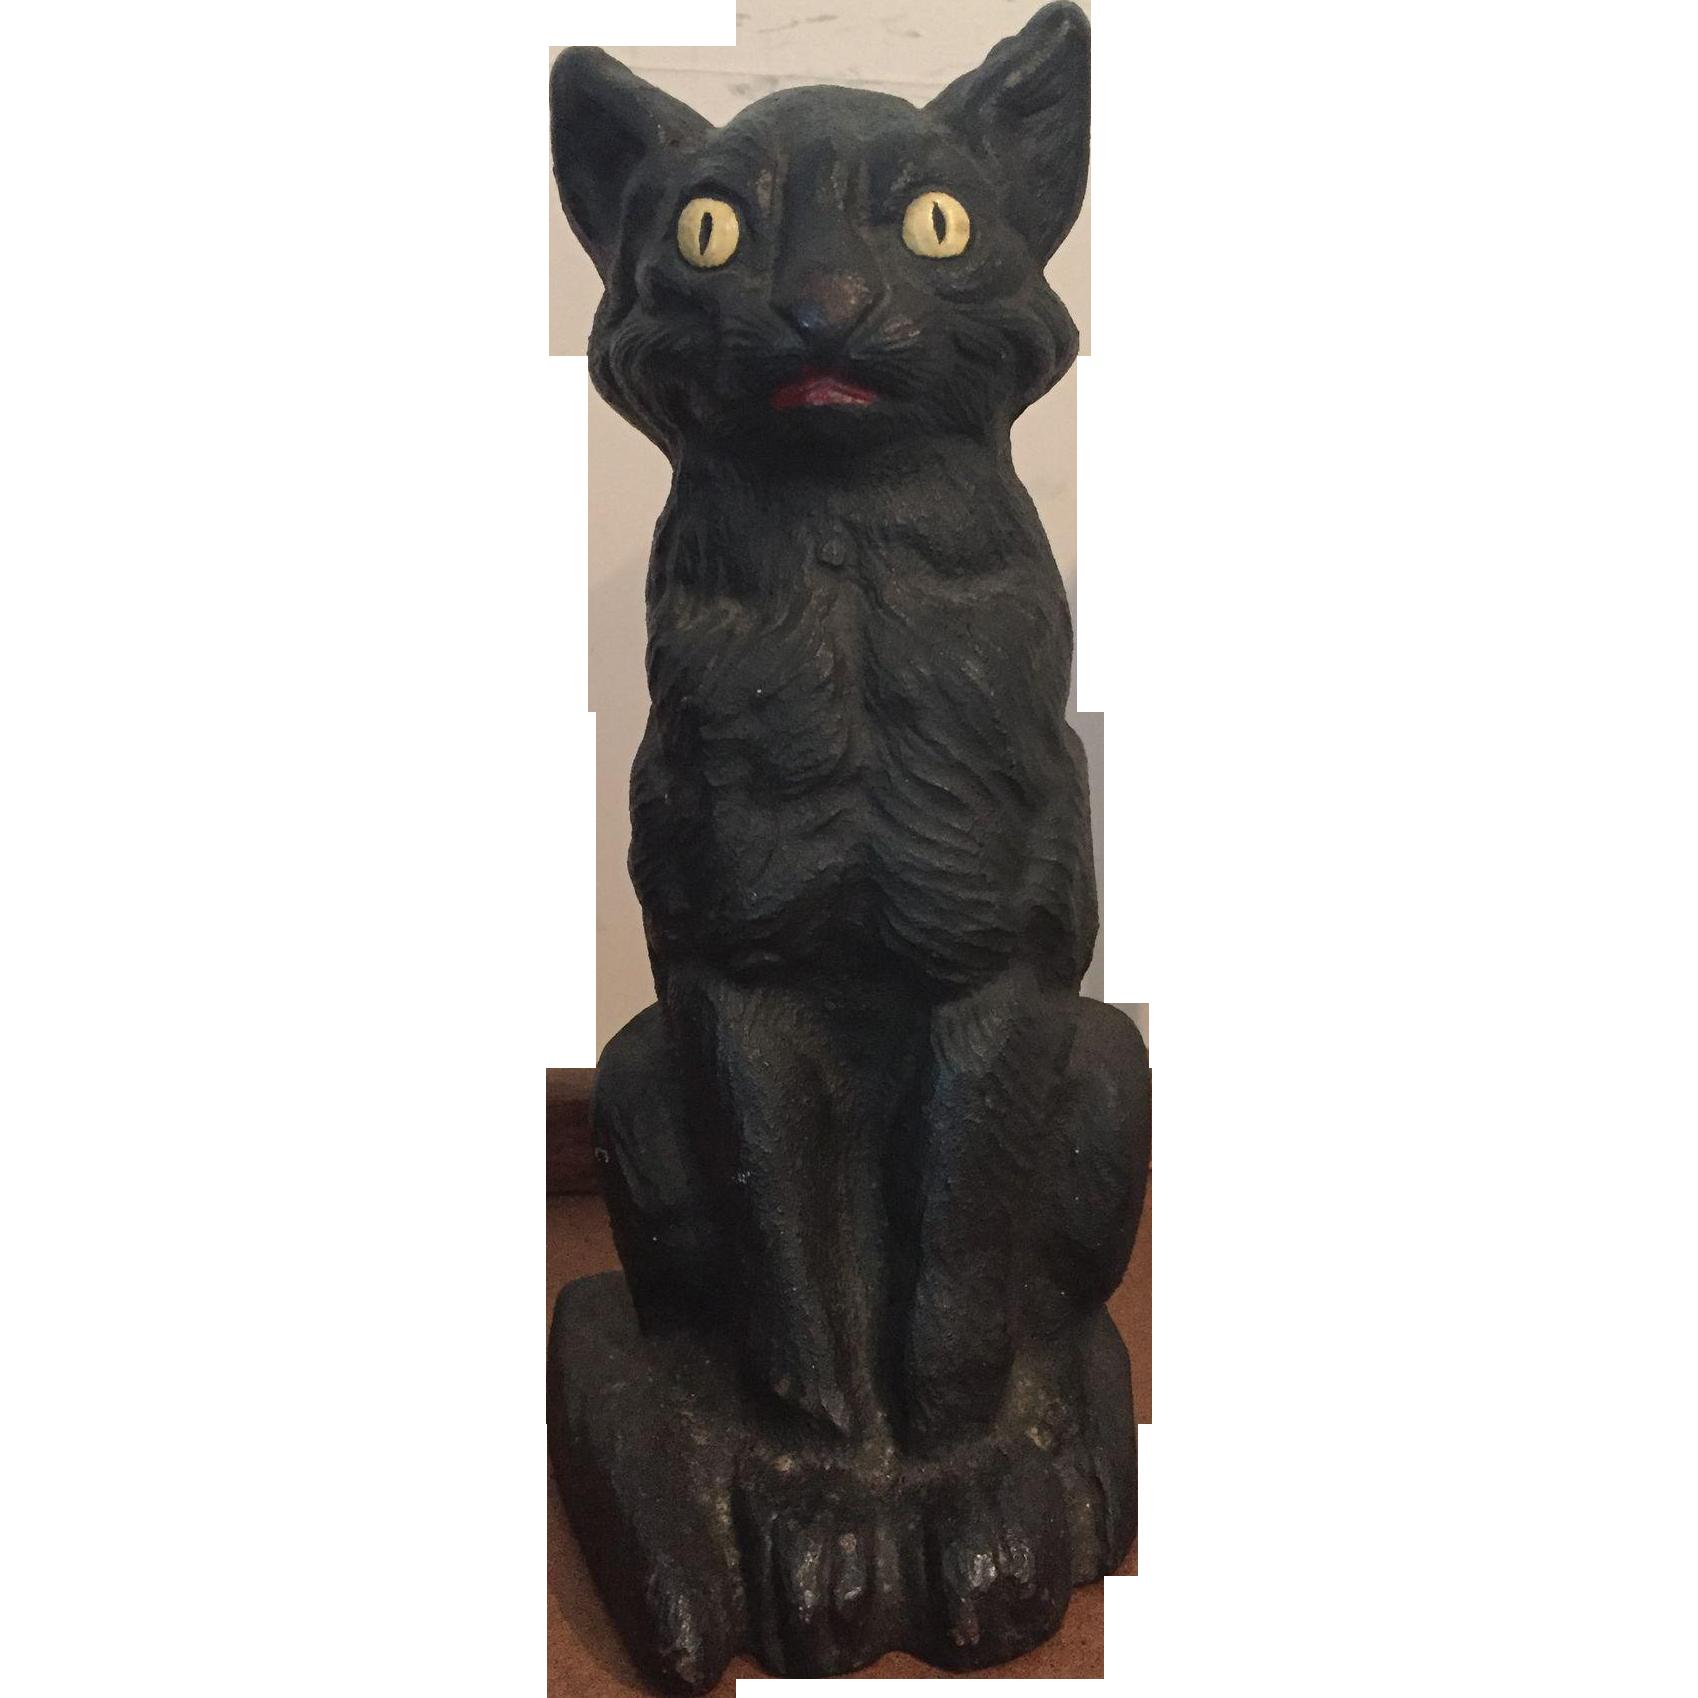 Hubley or National Foundry Halloween Black Cat Standing Doorstop ... banner freeuse download